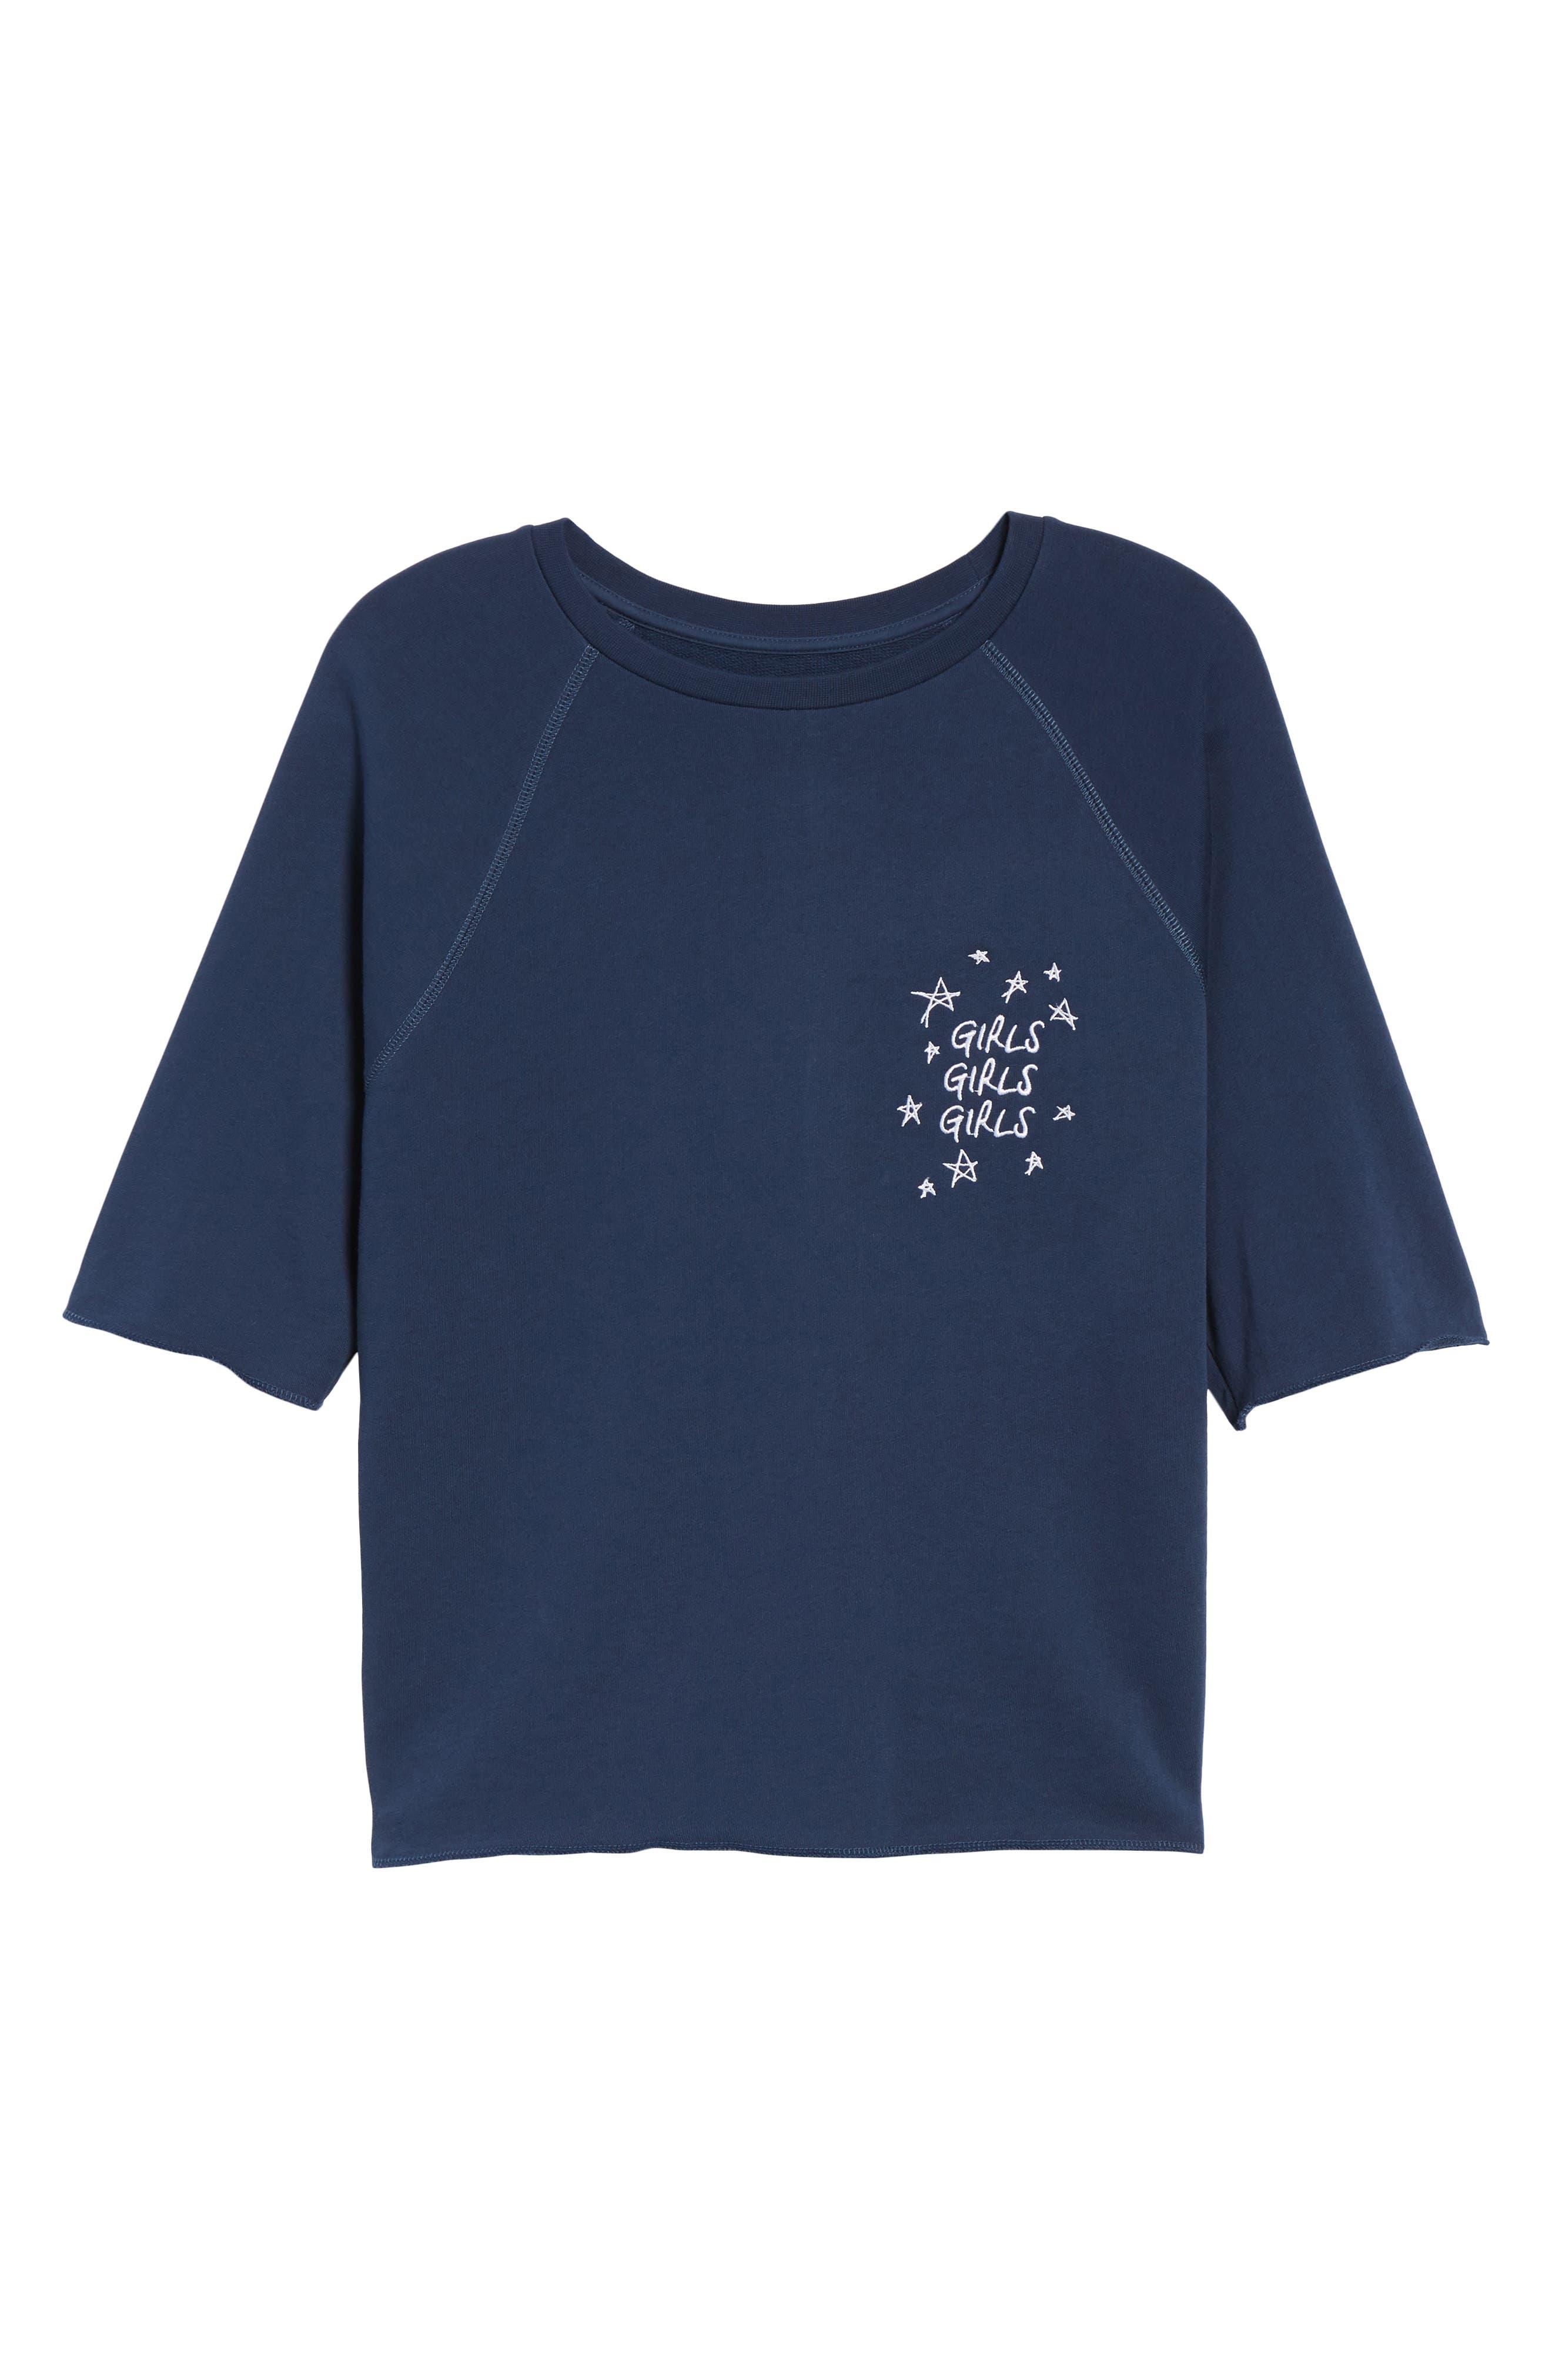 Girls Girls Girls Embroidered Sweatshirt,                             Alternate thumbnail 6, color,                             NAVY